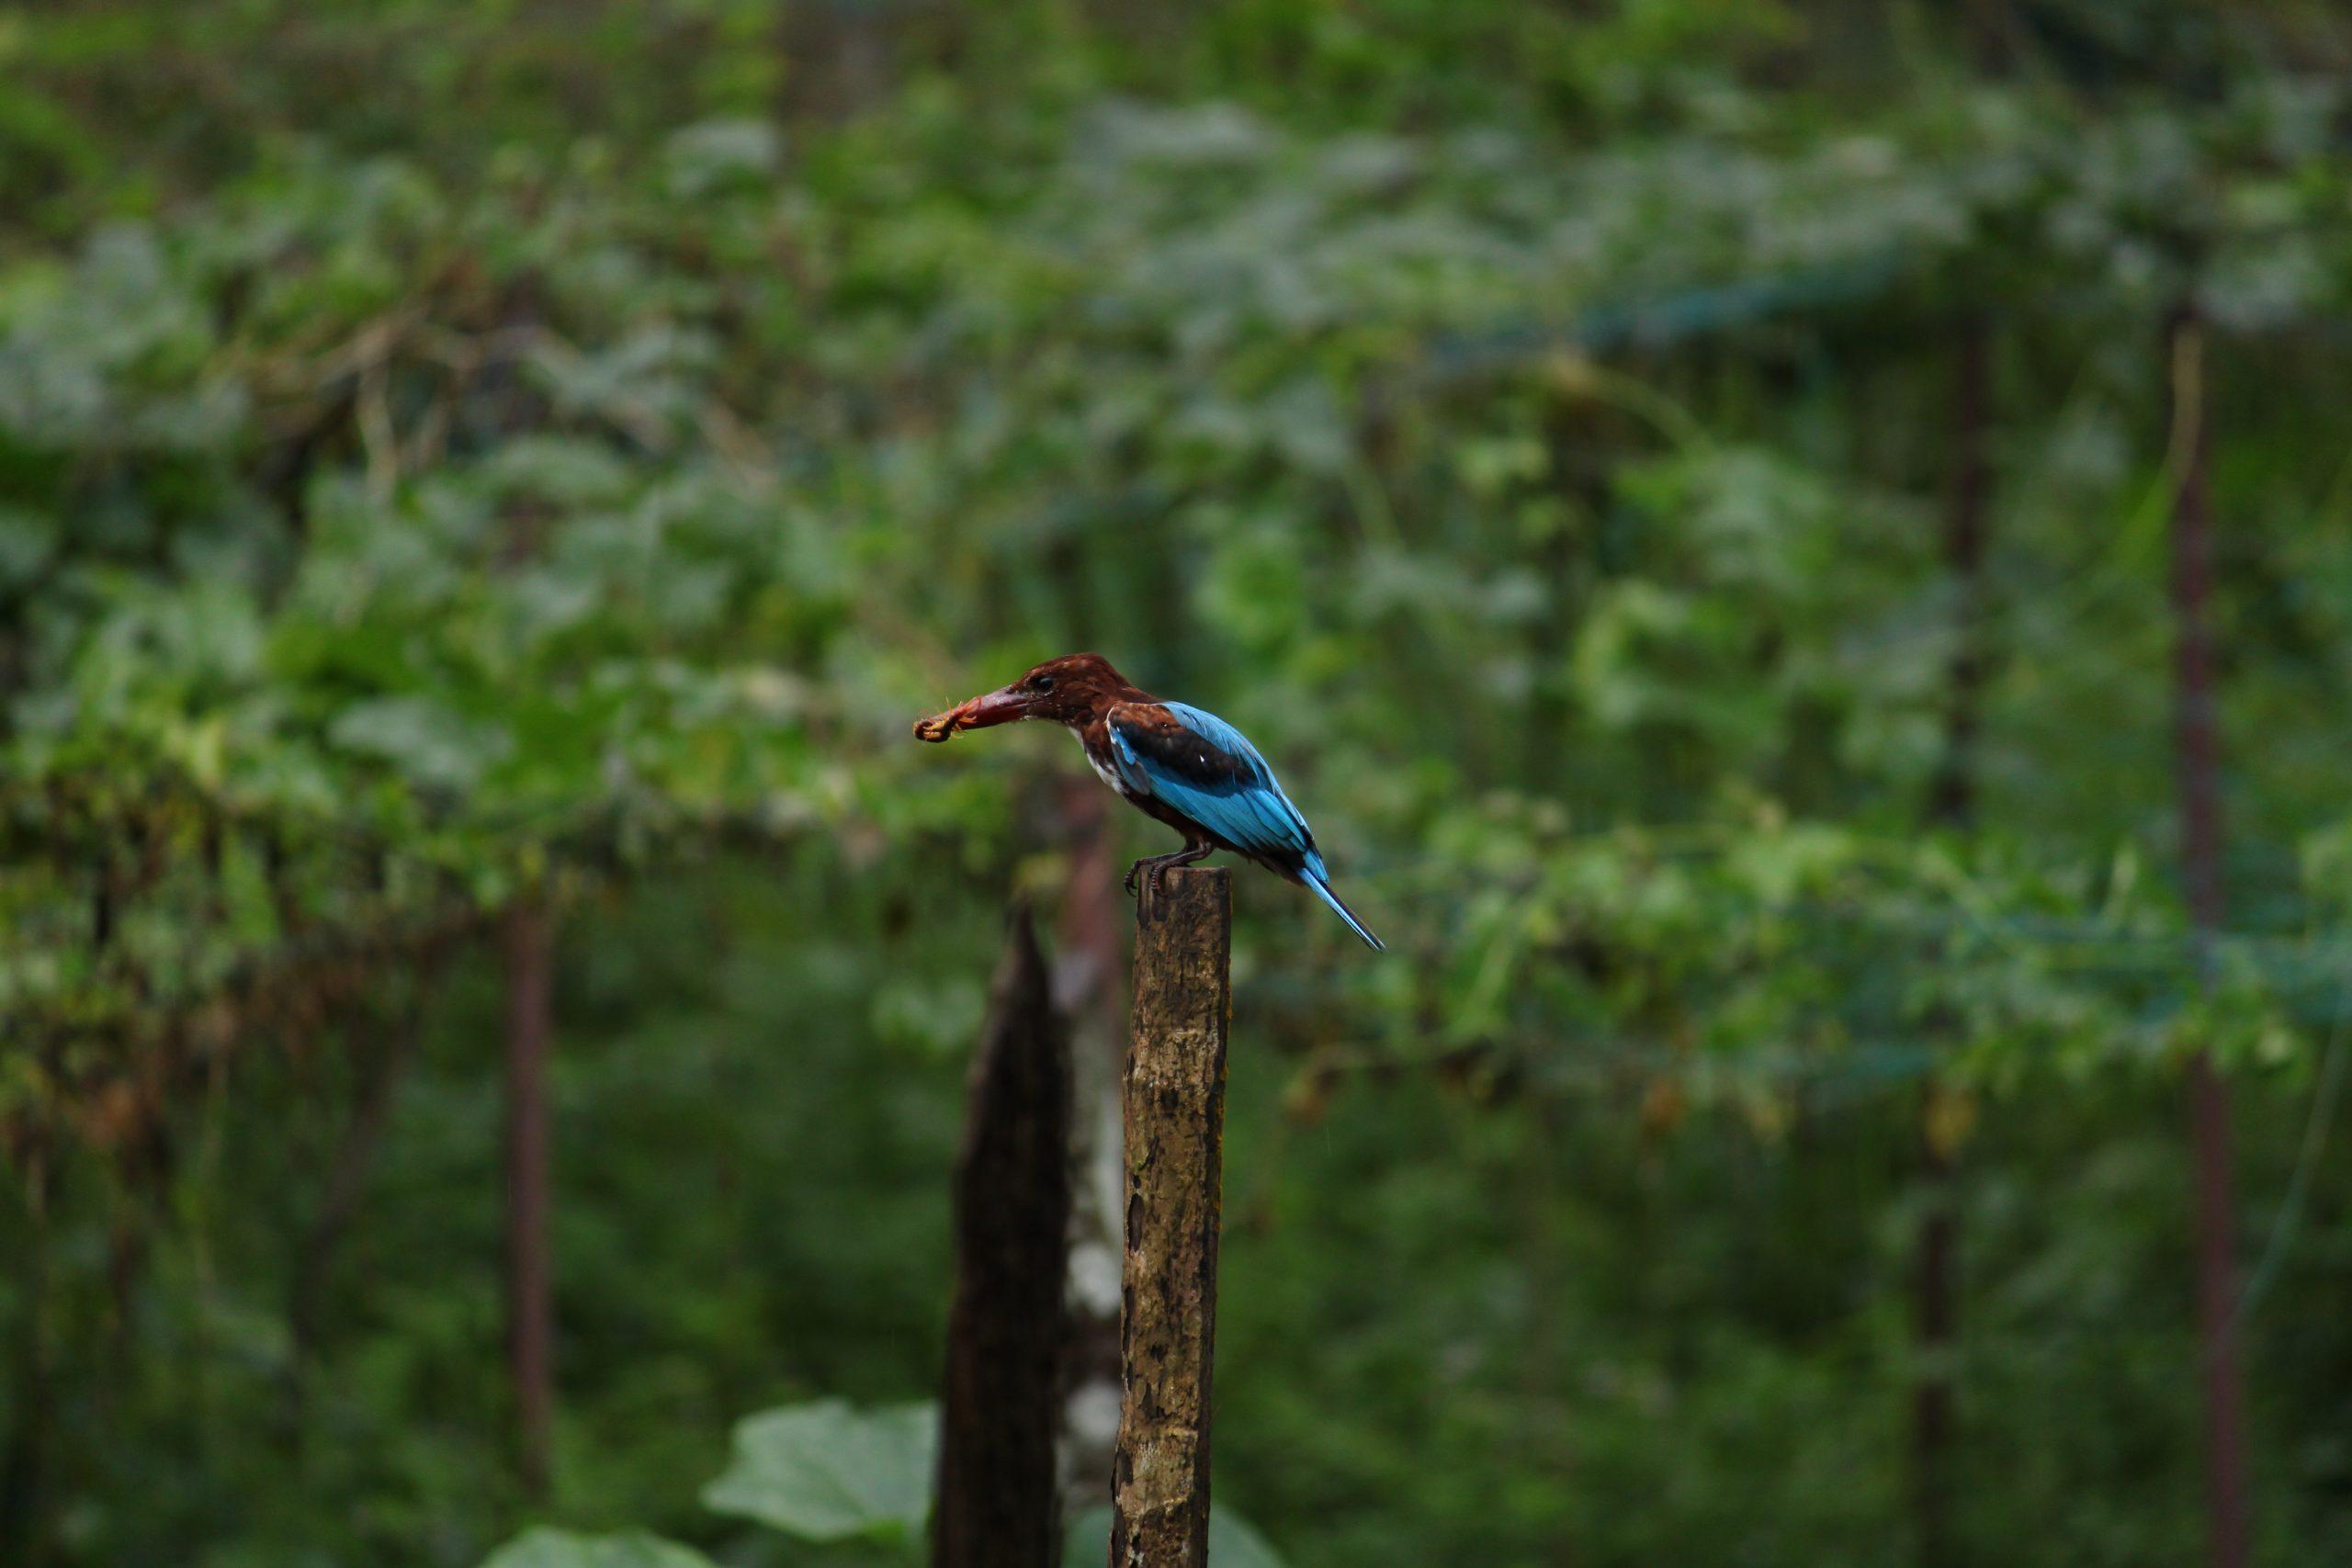 Bird sitting on a Stick on Focus